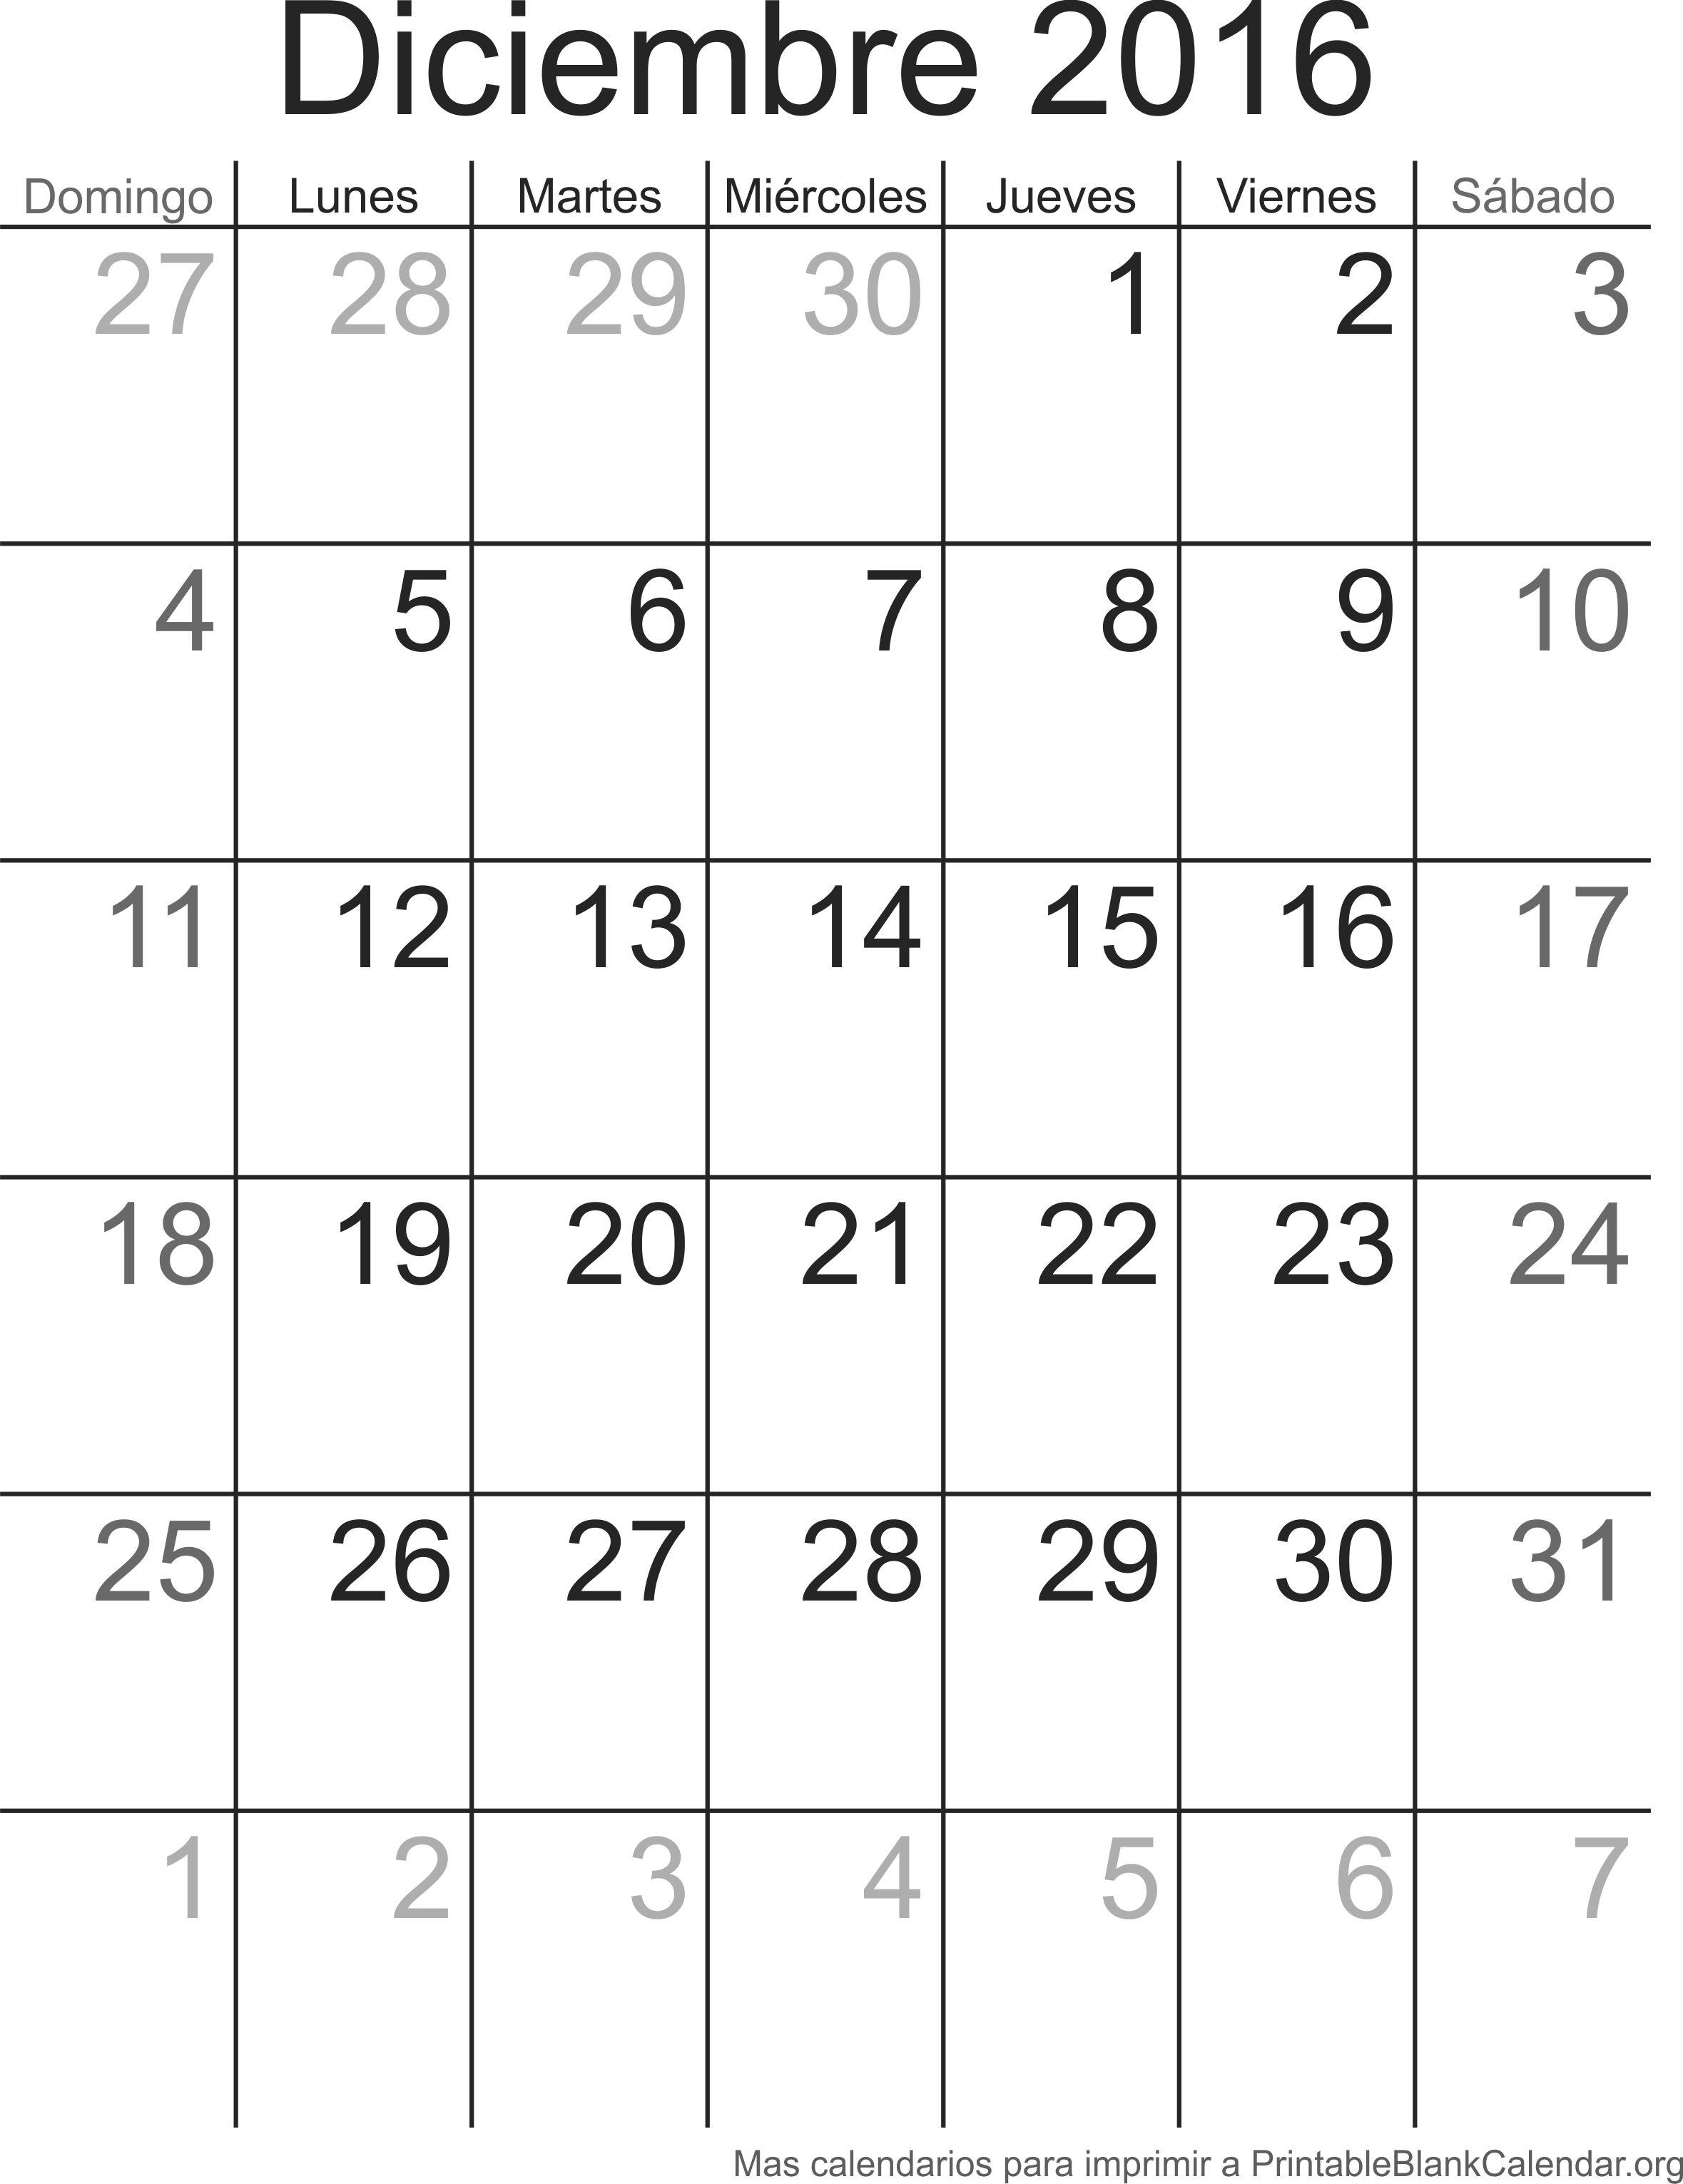 calendario para imprimir deciembre 2016